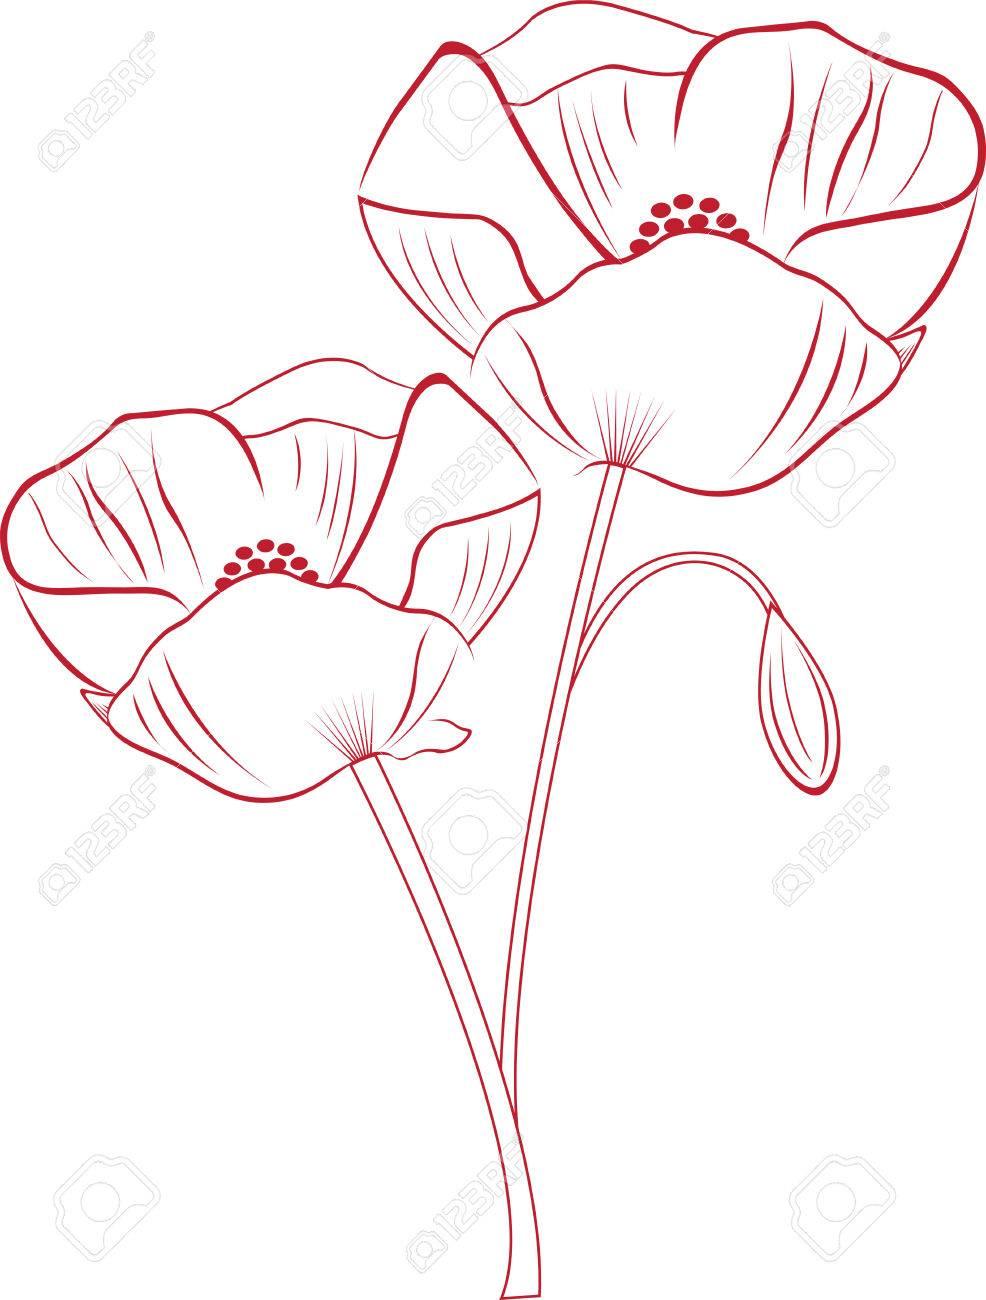 Captura La Belleza Exótica De Flores De Amapola Con Este Diseño Por ...